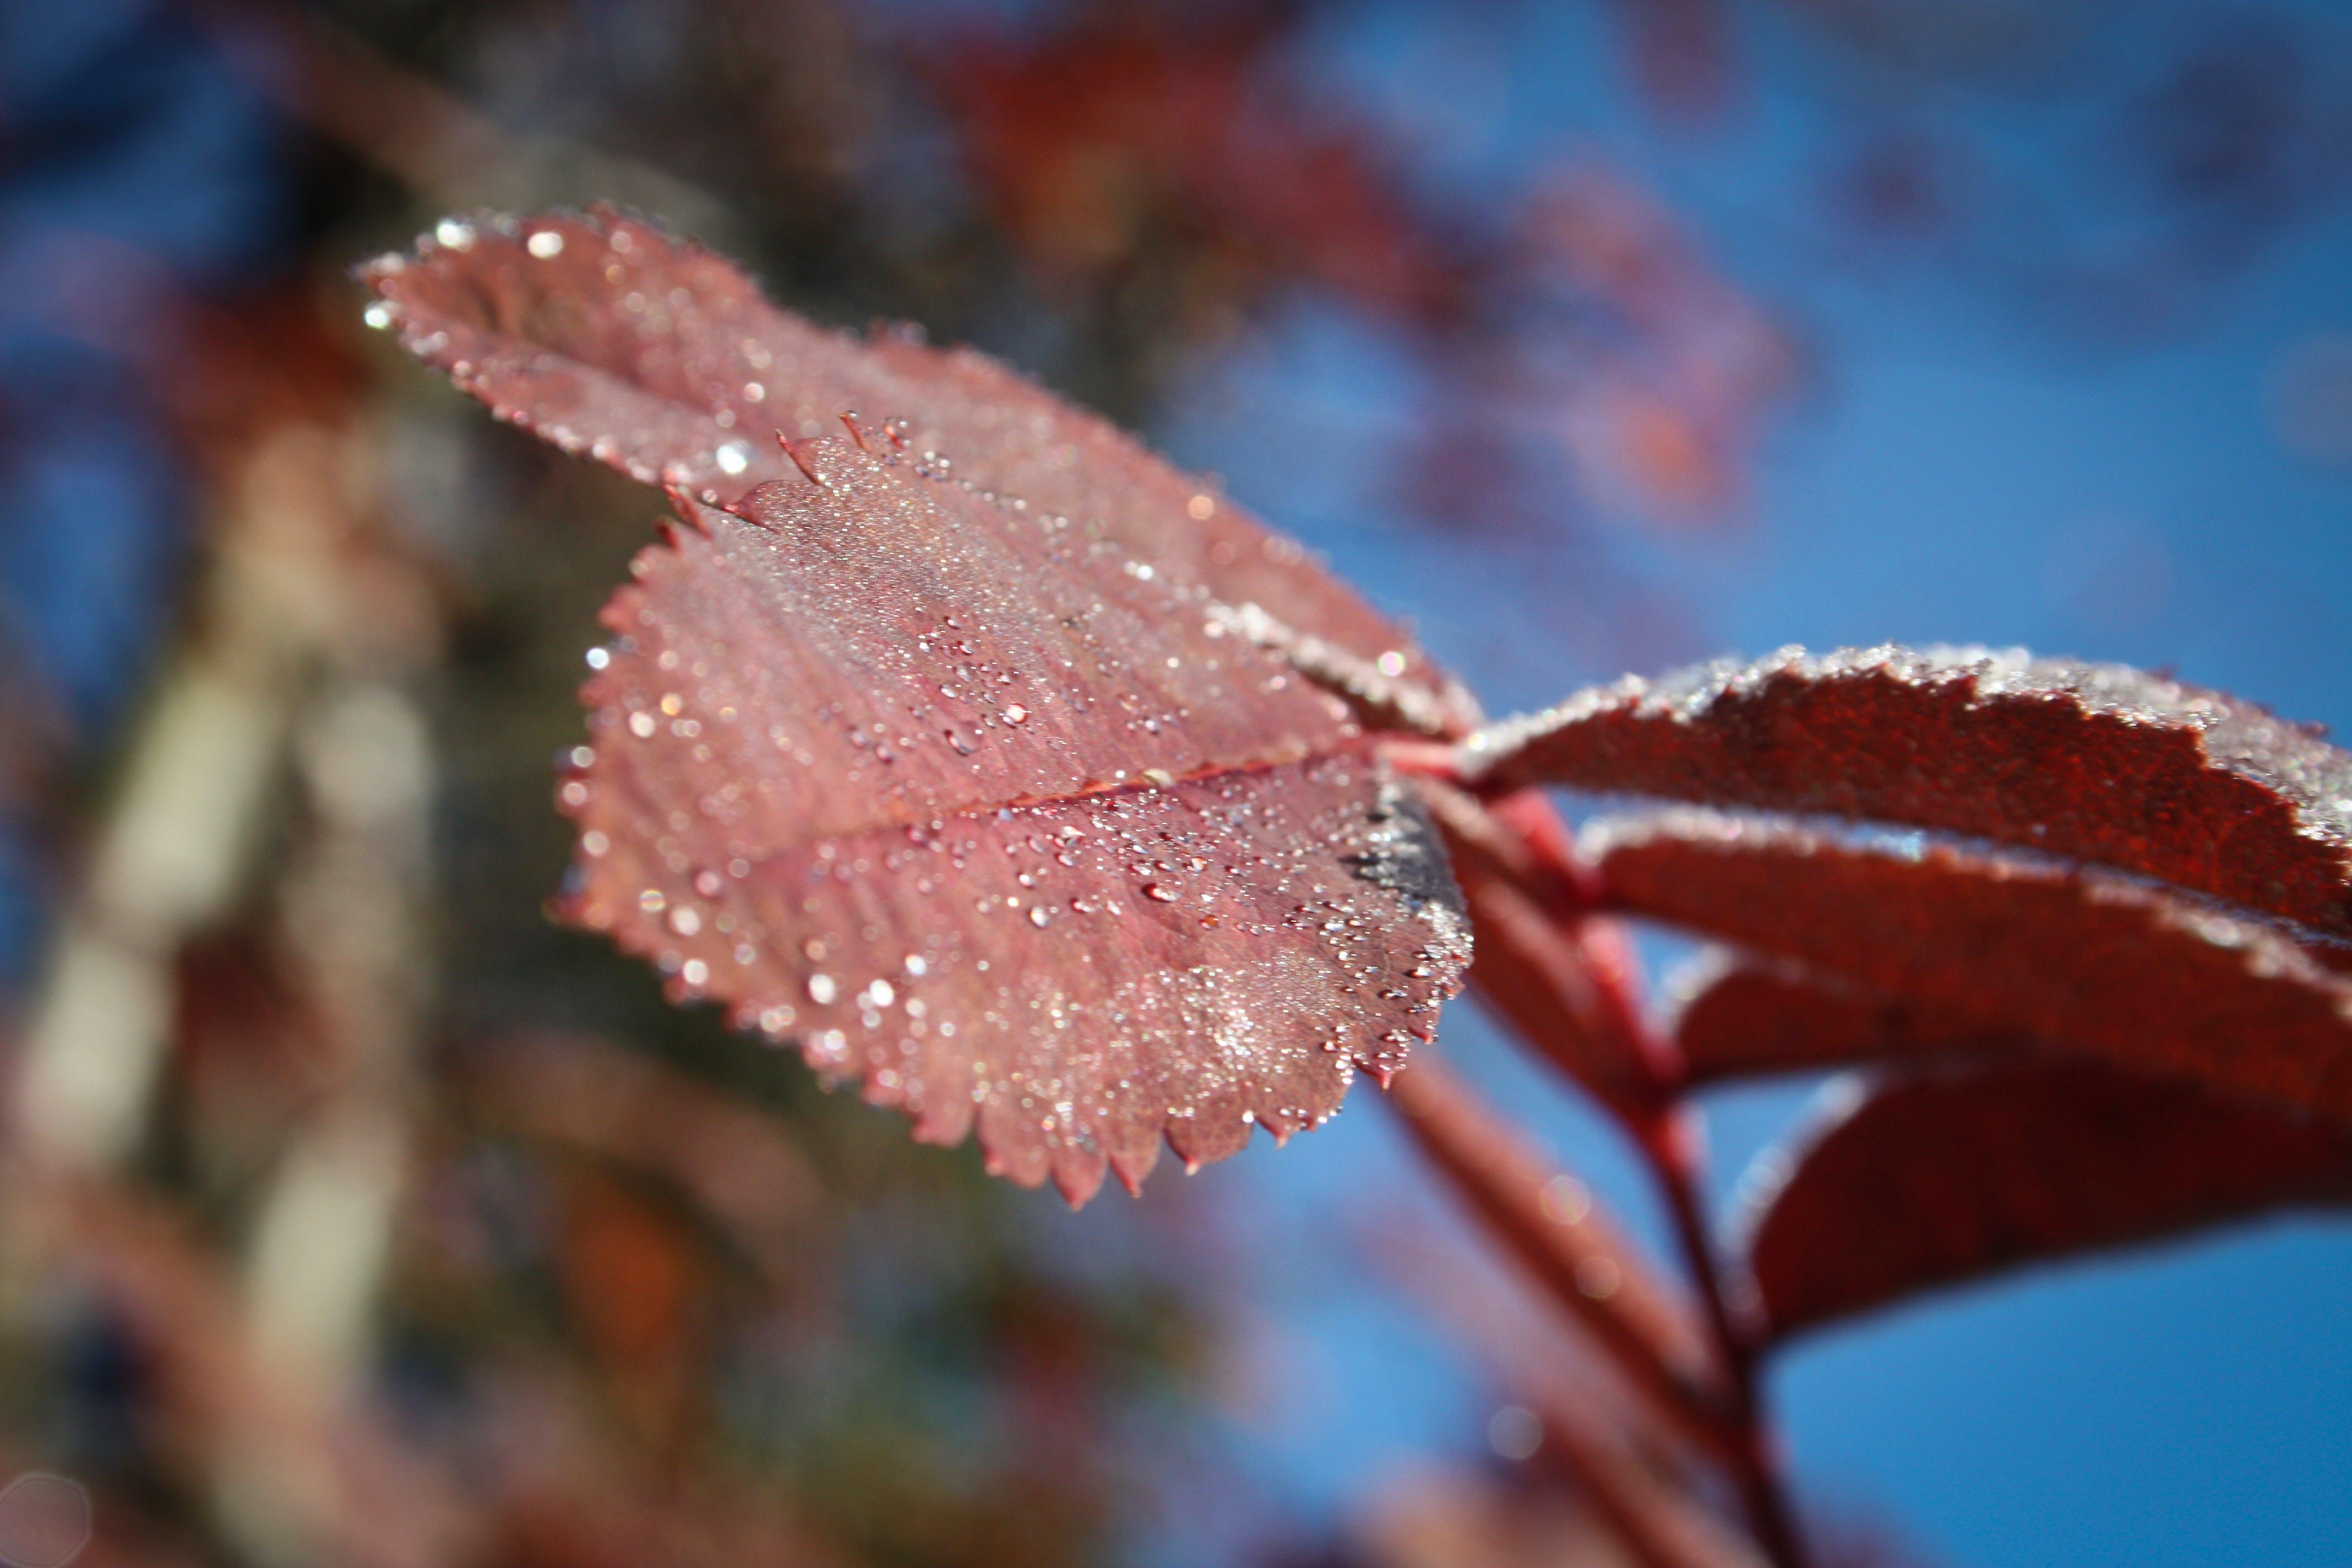 Close Up Image of Red Color of Leaf